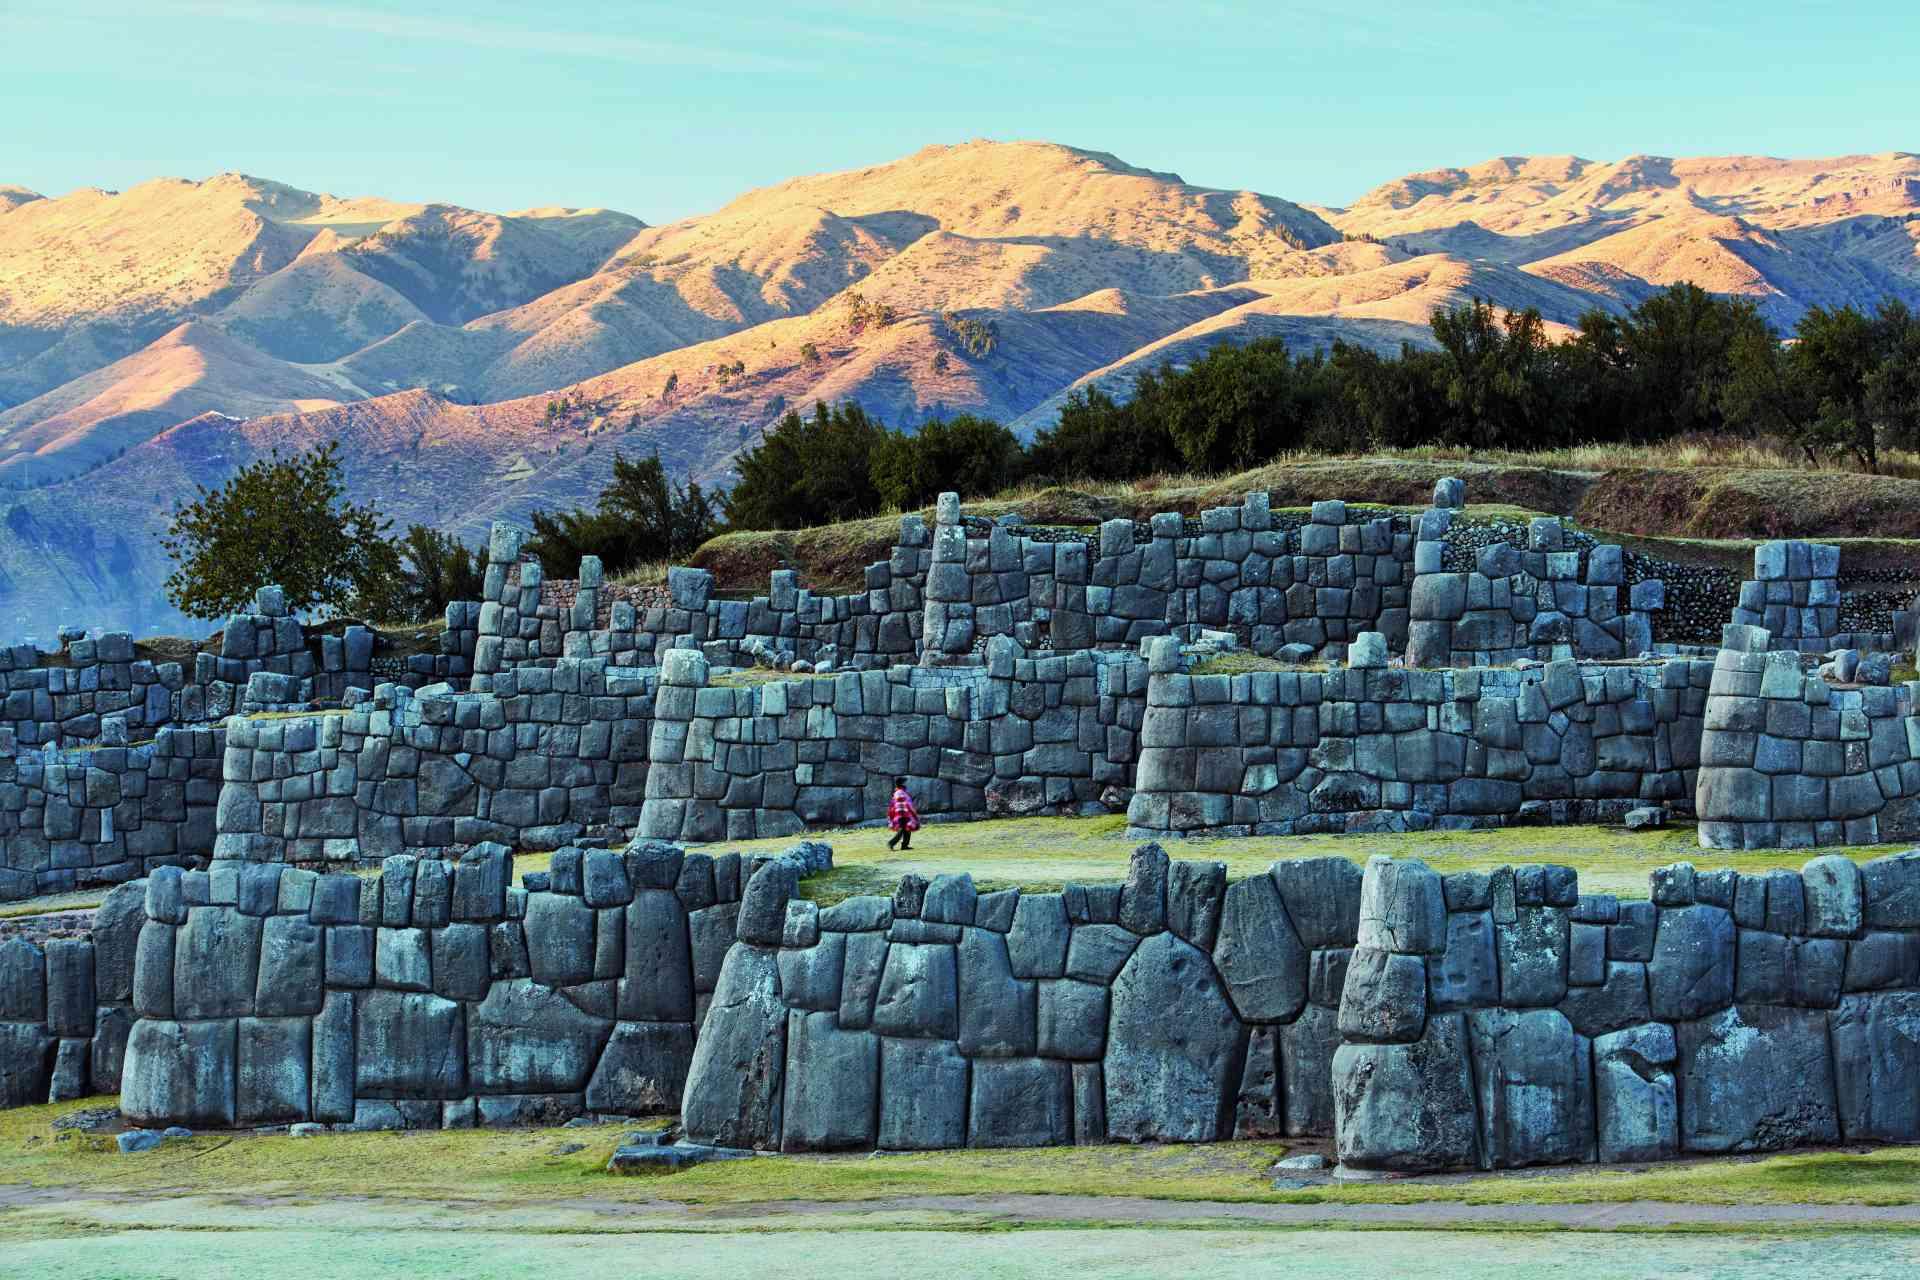 Sacsayhuaman, Peru by Belmond Images